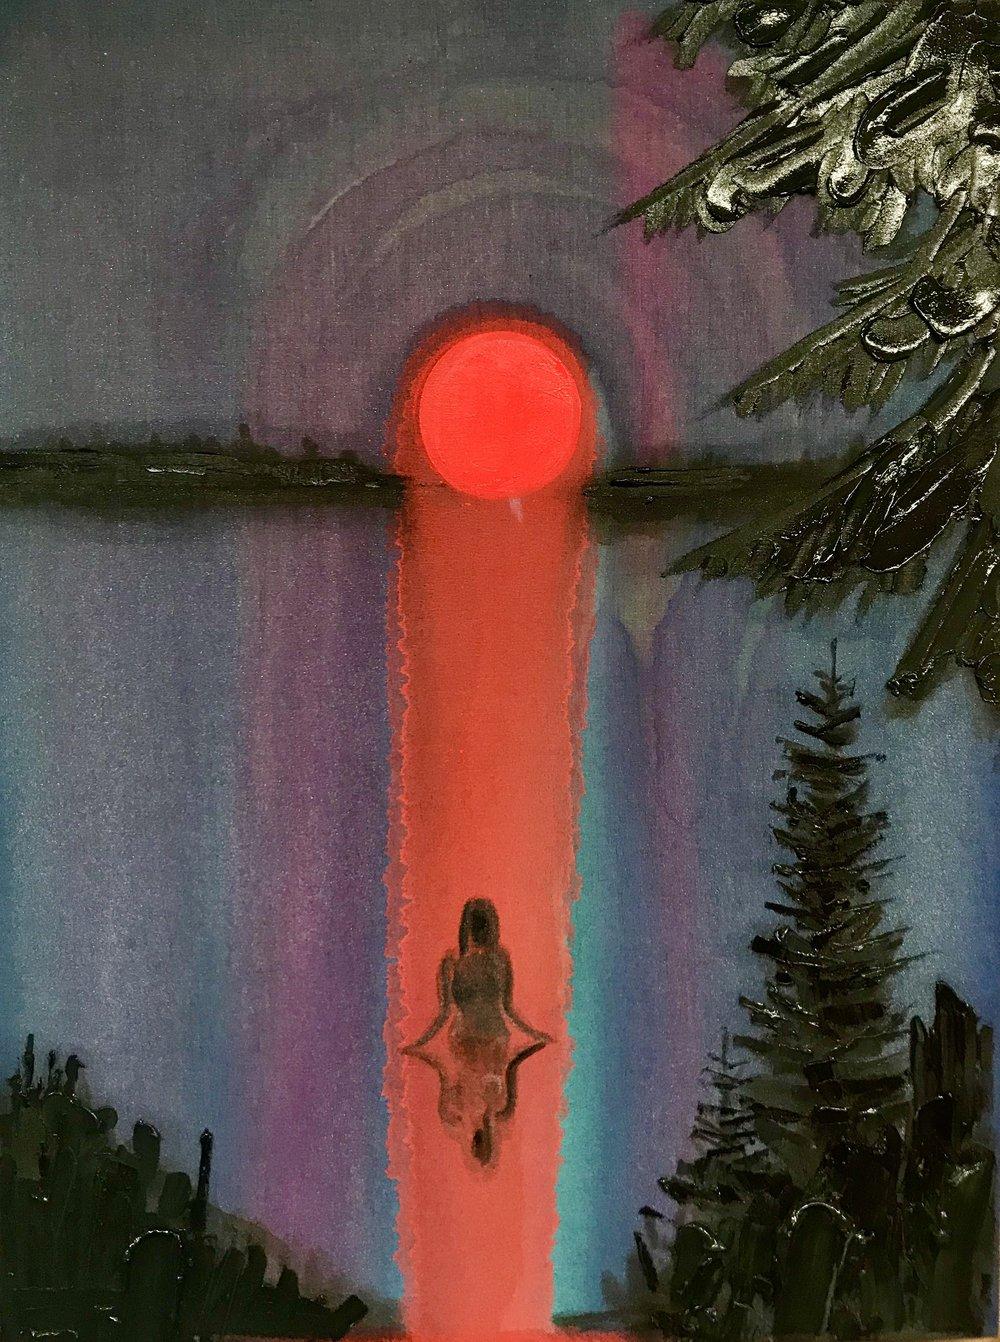 Kim Dorland - Last Sunset